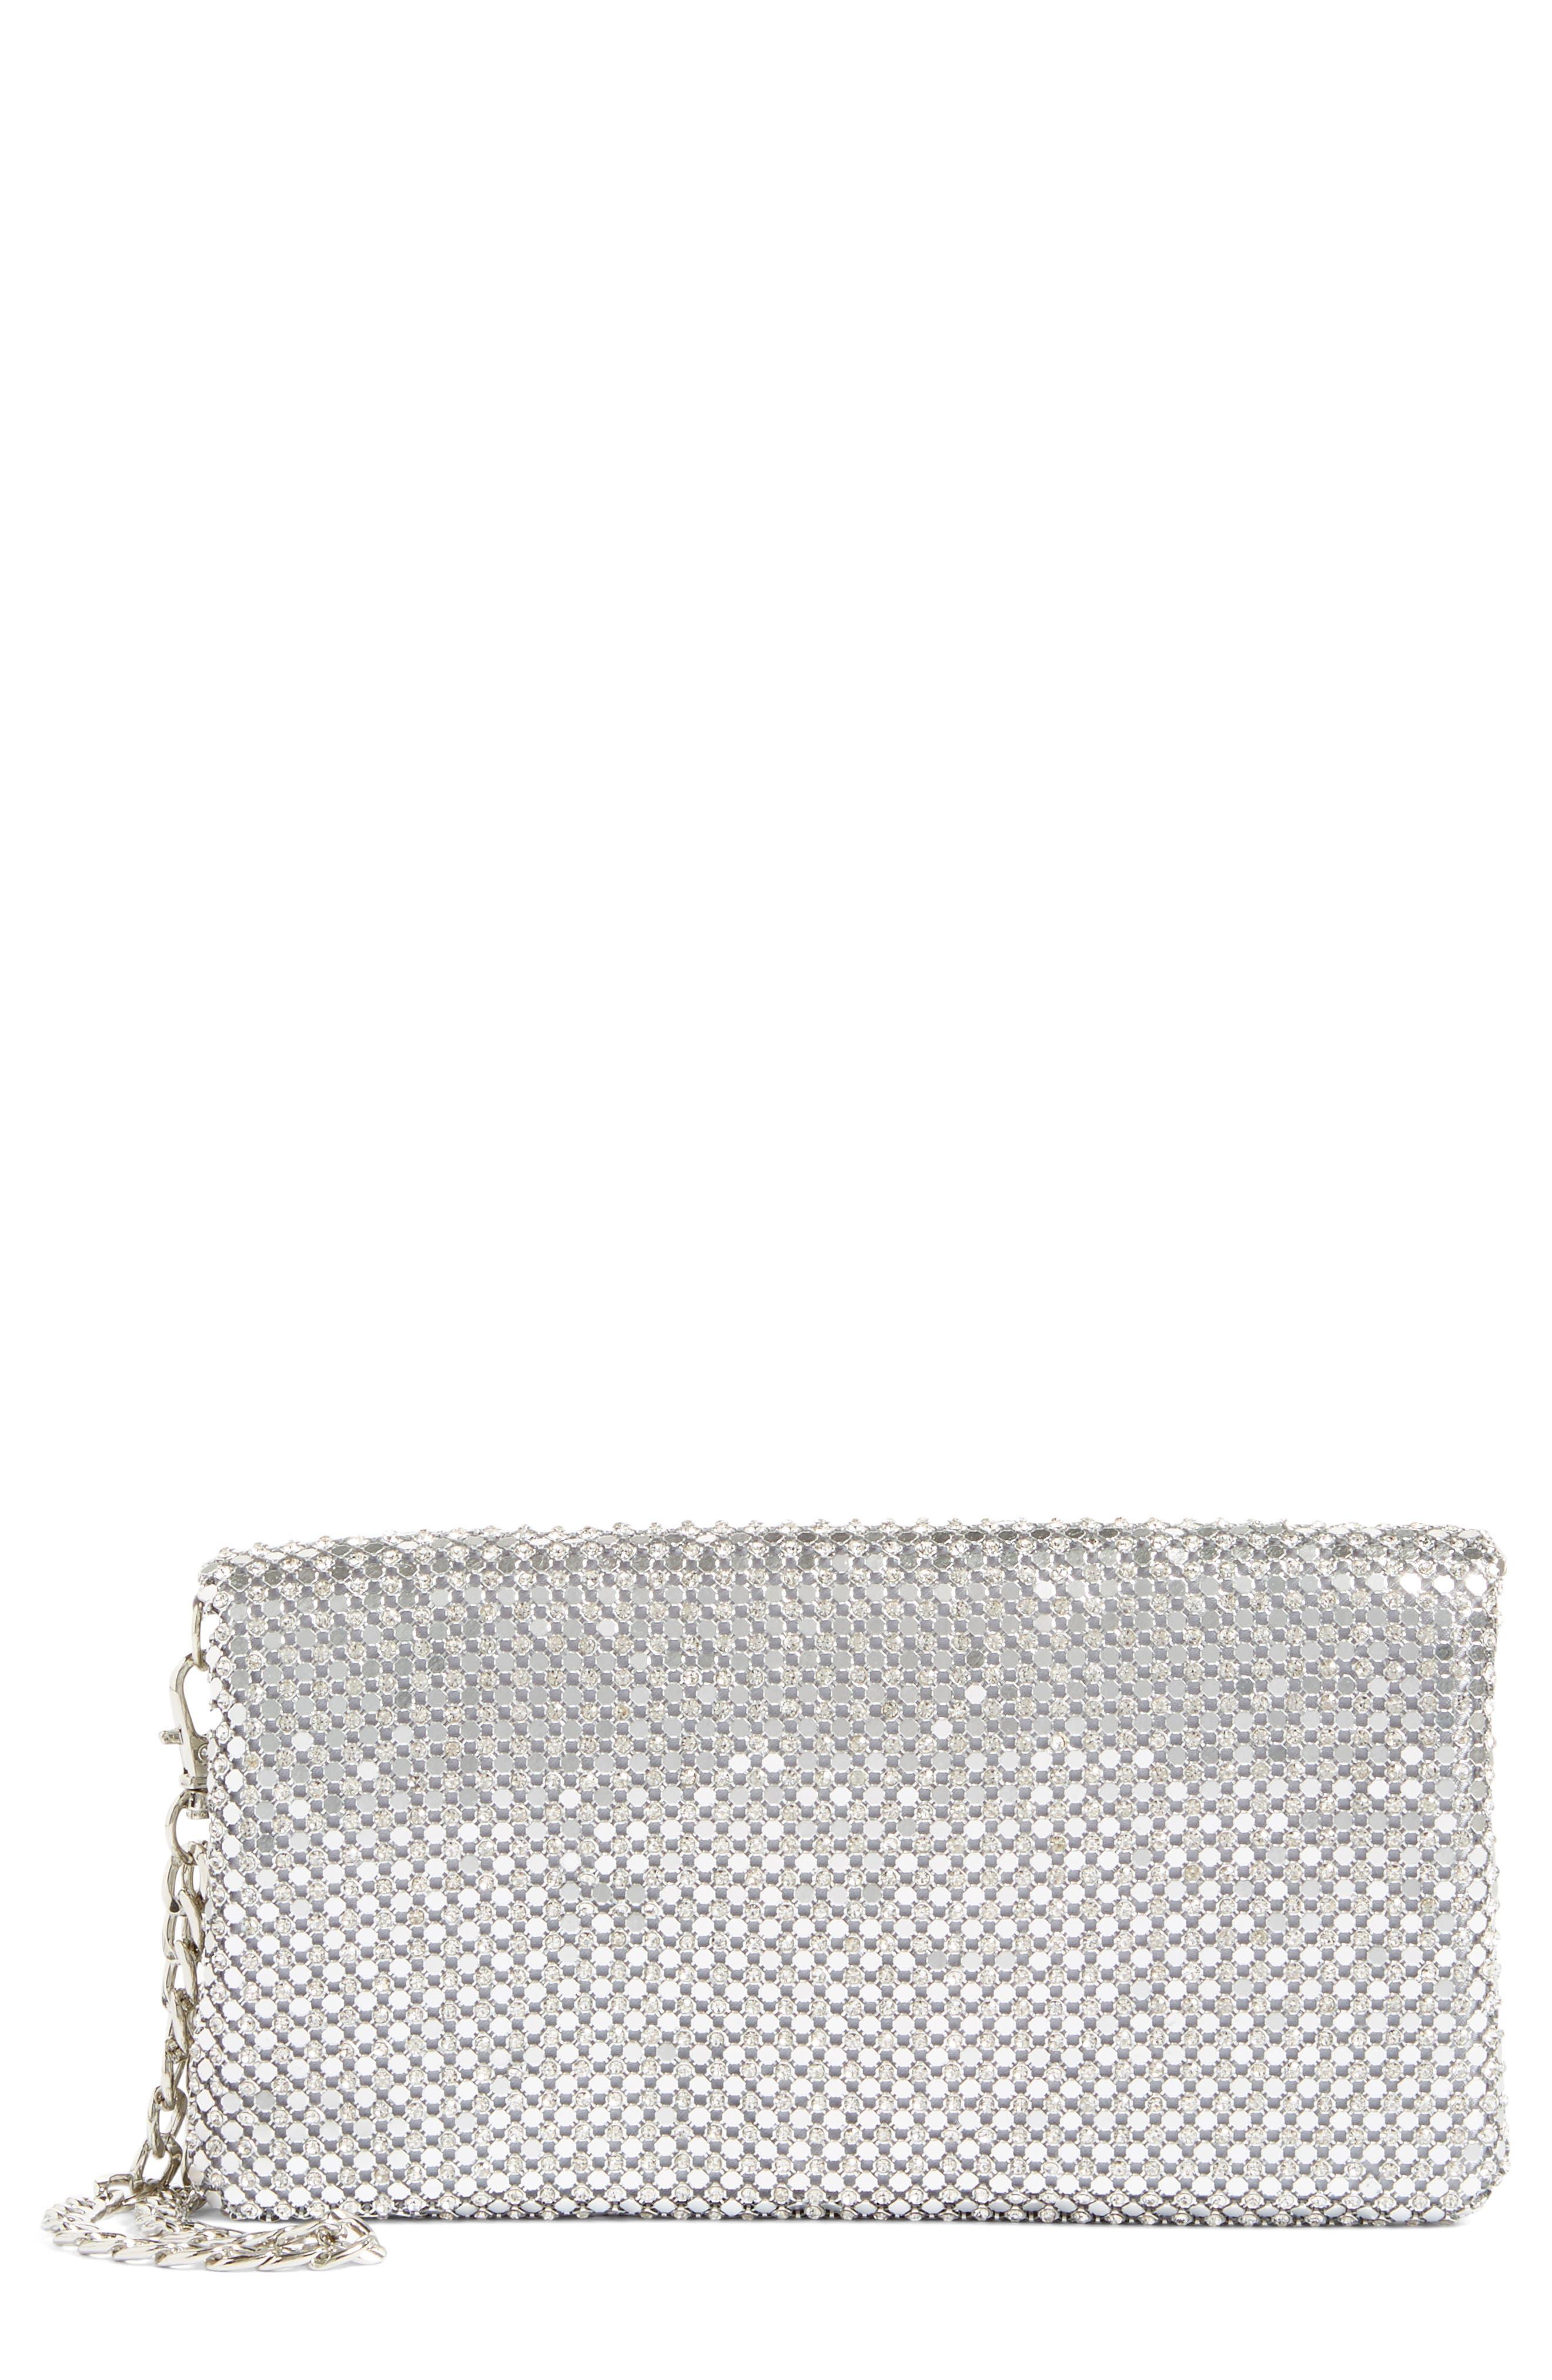 Main Image - Glint Crystal Mesh Foldover Clutch